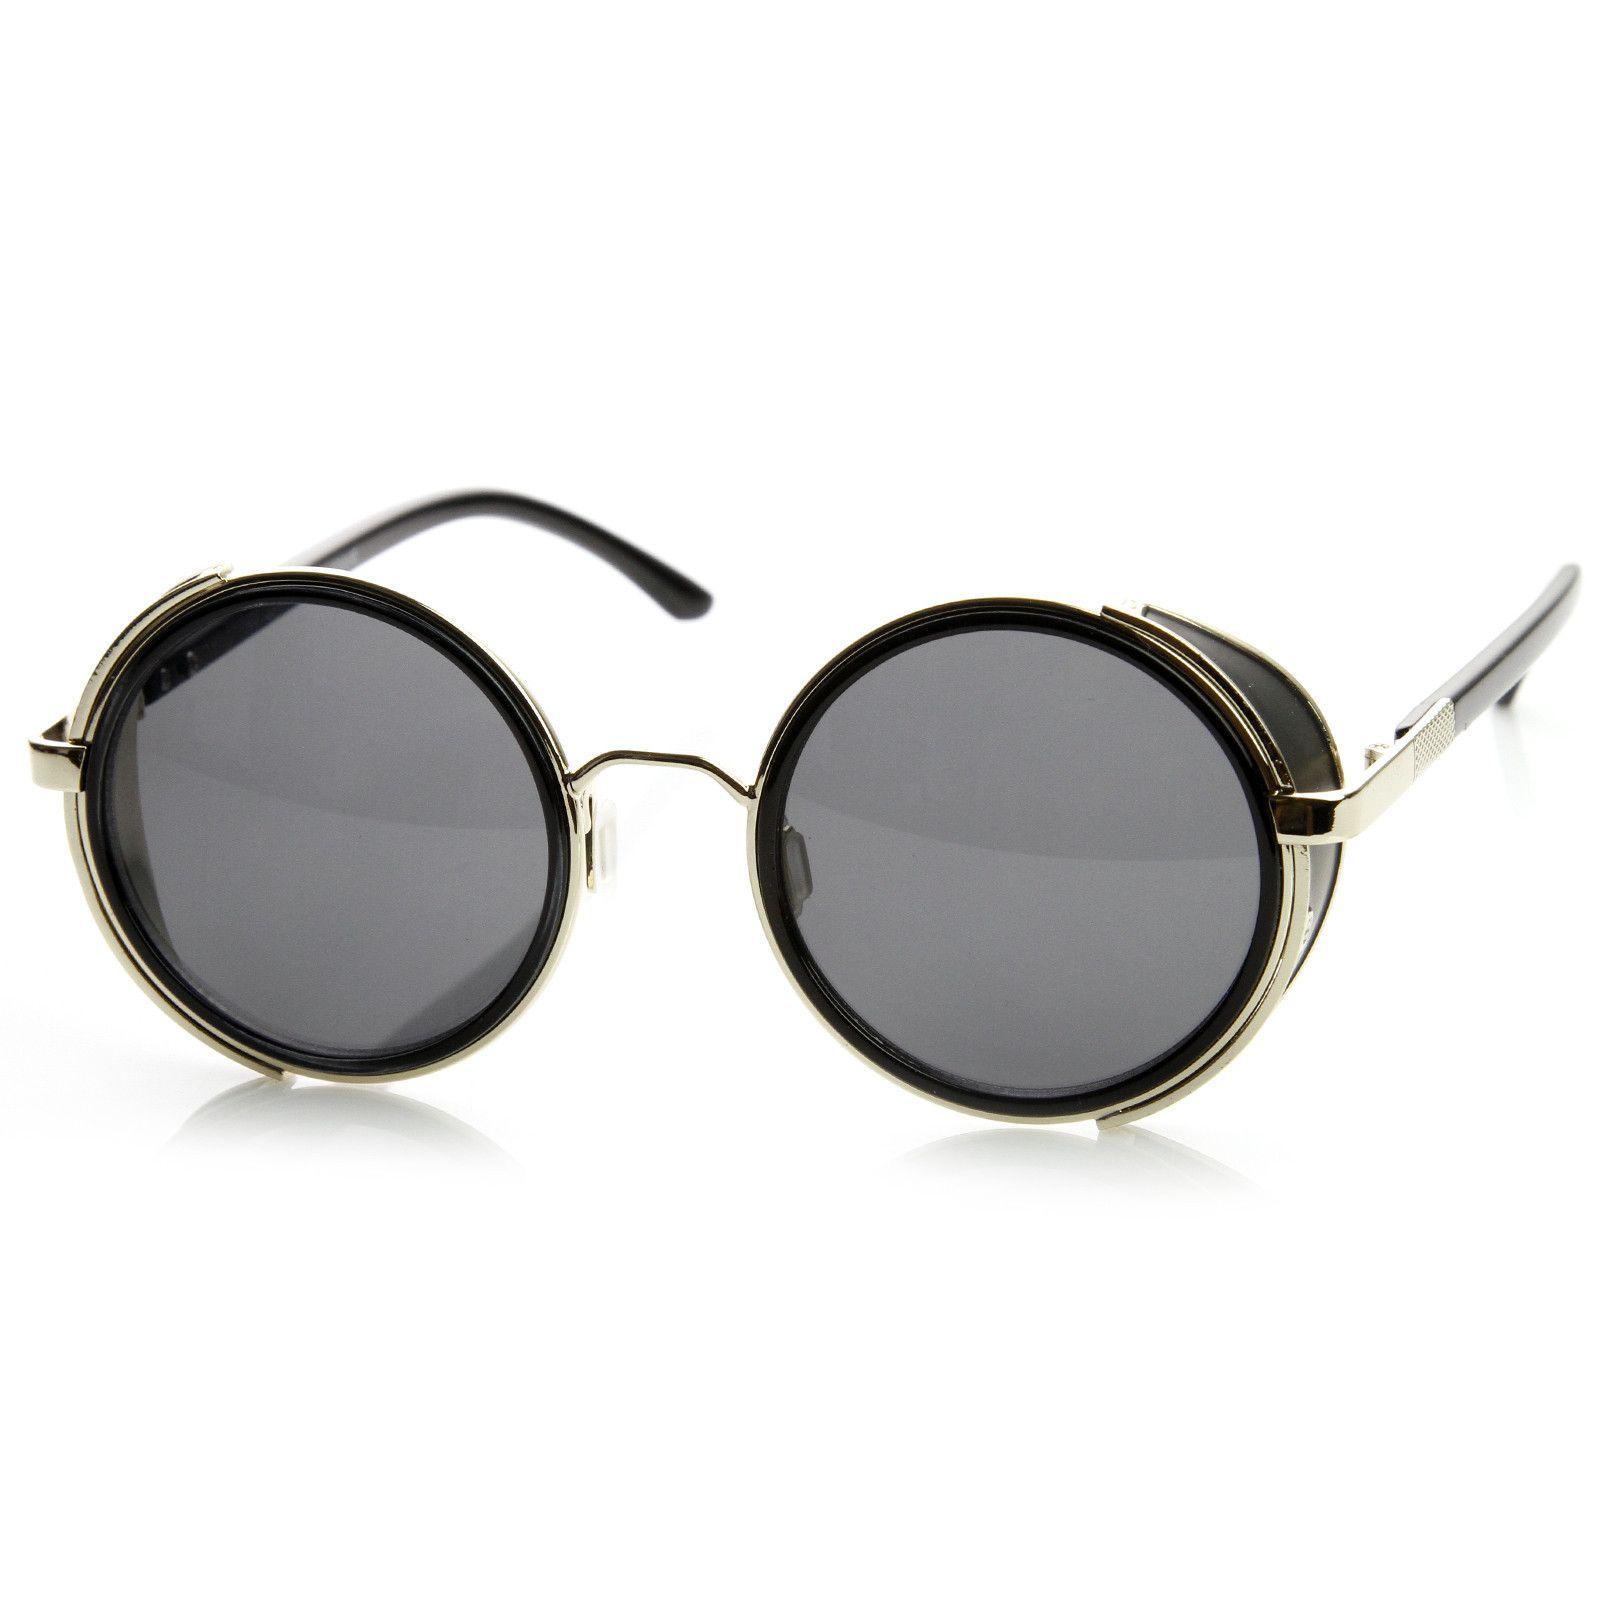 8910f4350661c Vintage Steampunk Studio Cover Round Metal Designer Sunglasses 8976